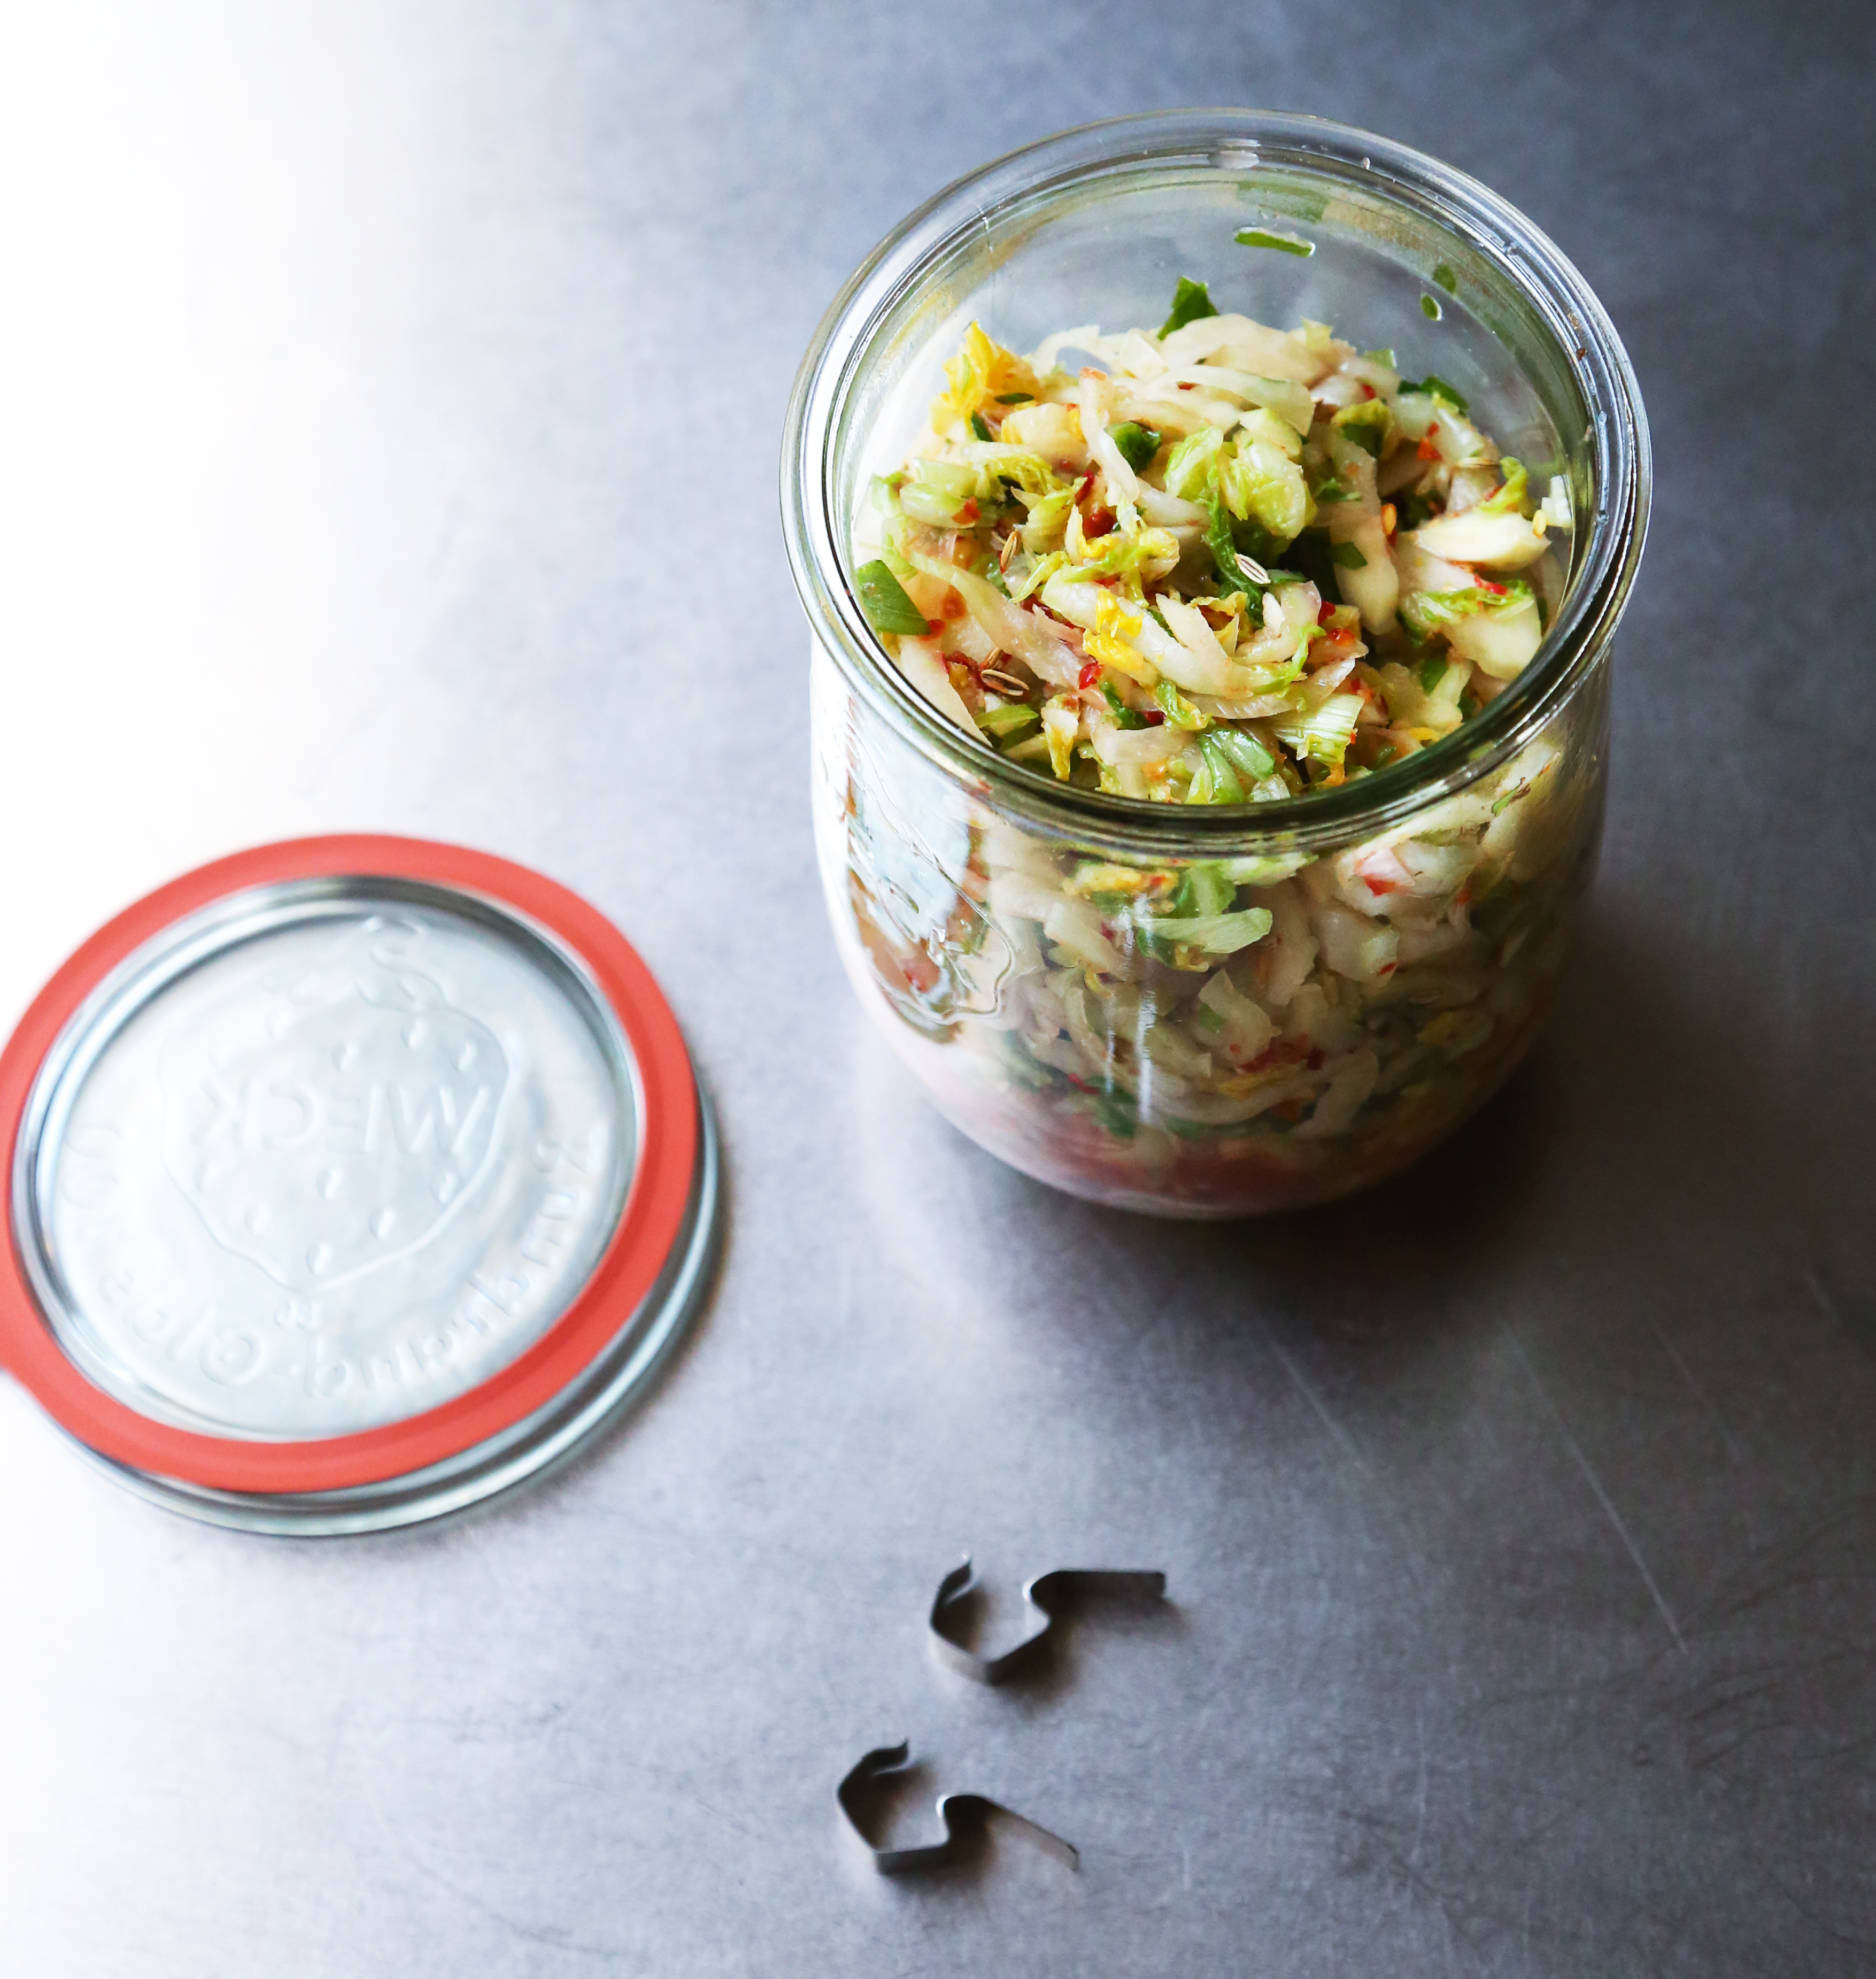 Green Kitchen Kimchi: Quick Fennel And Cabbage Kimchi